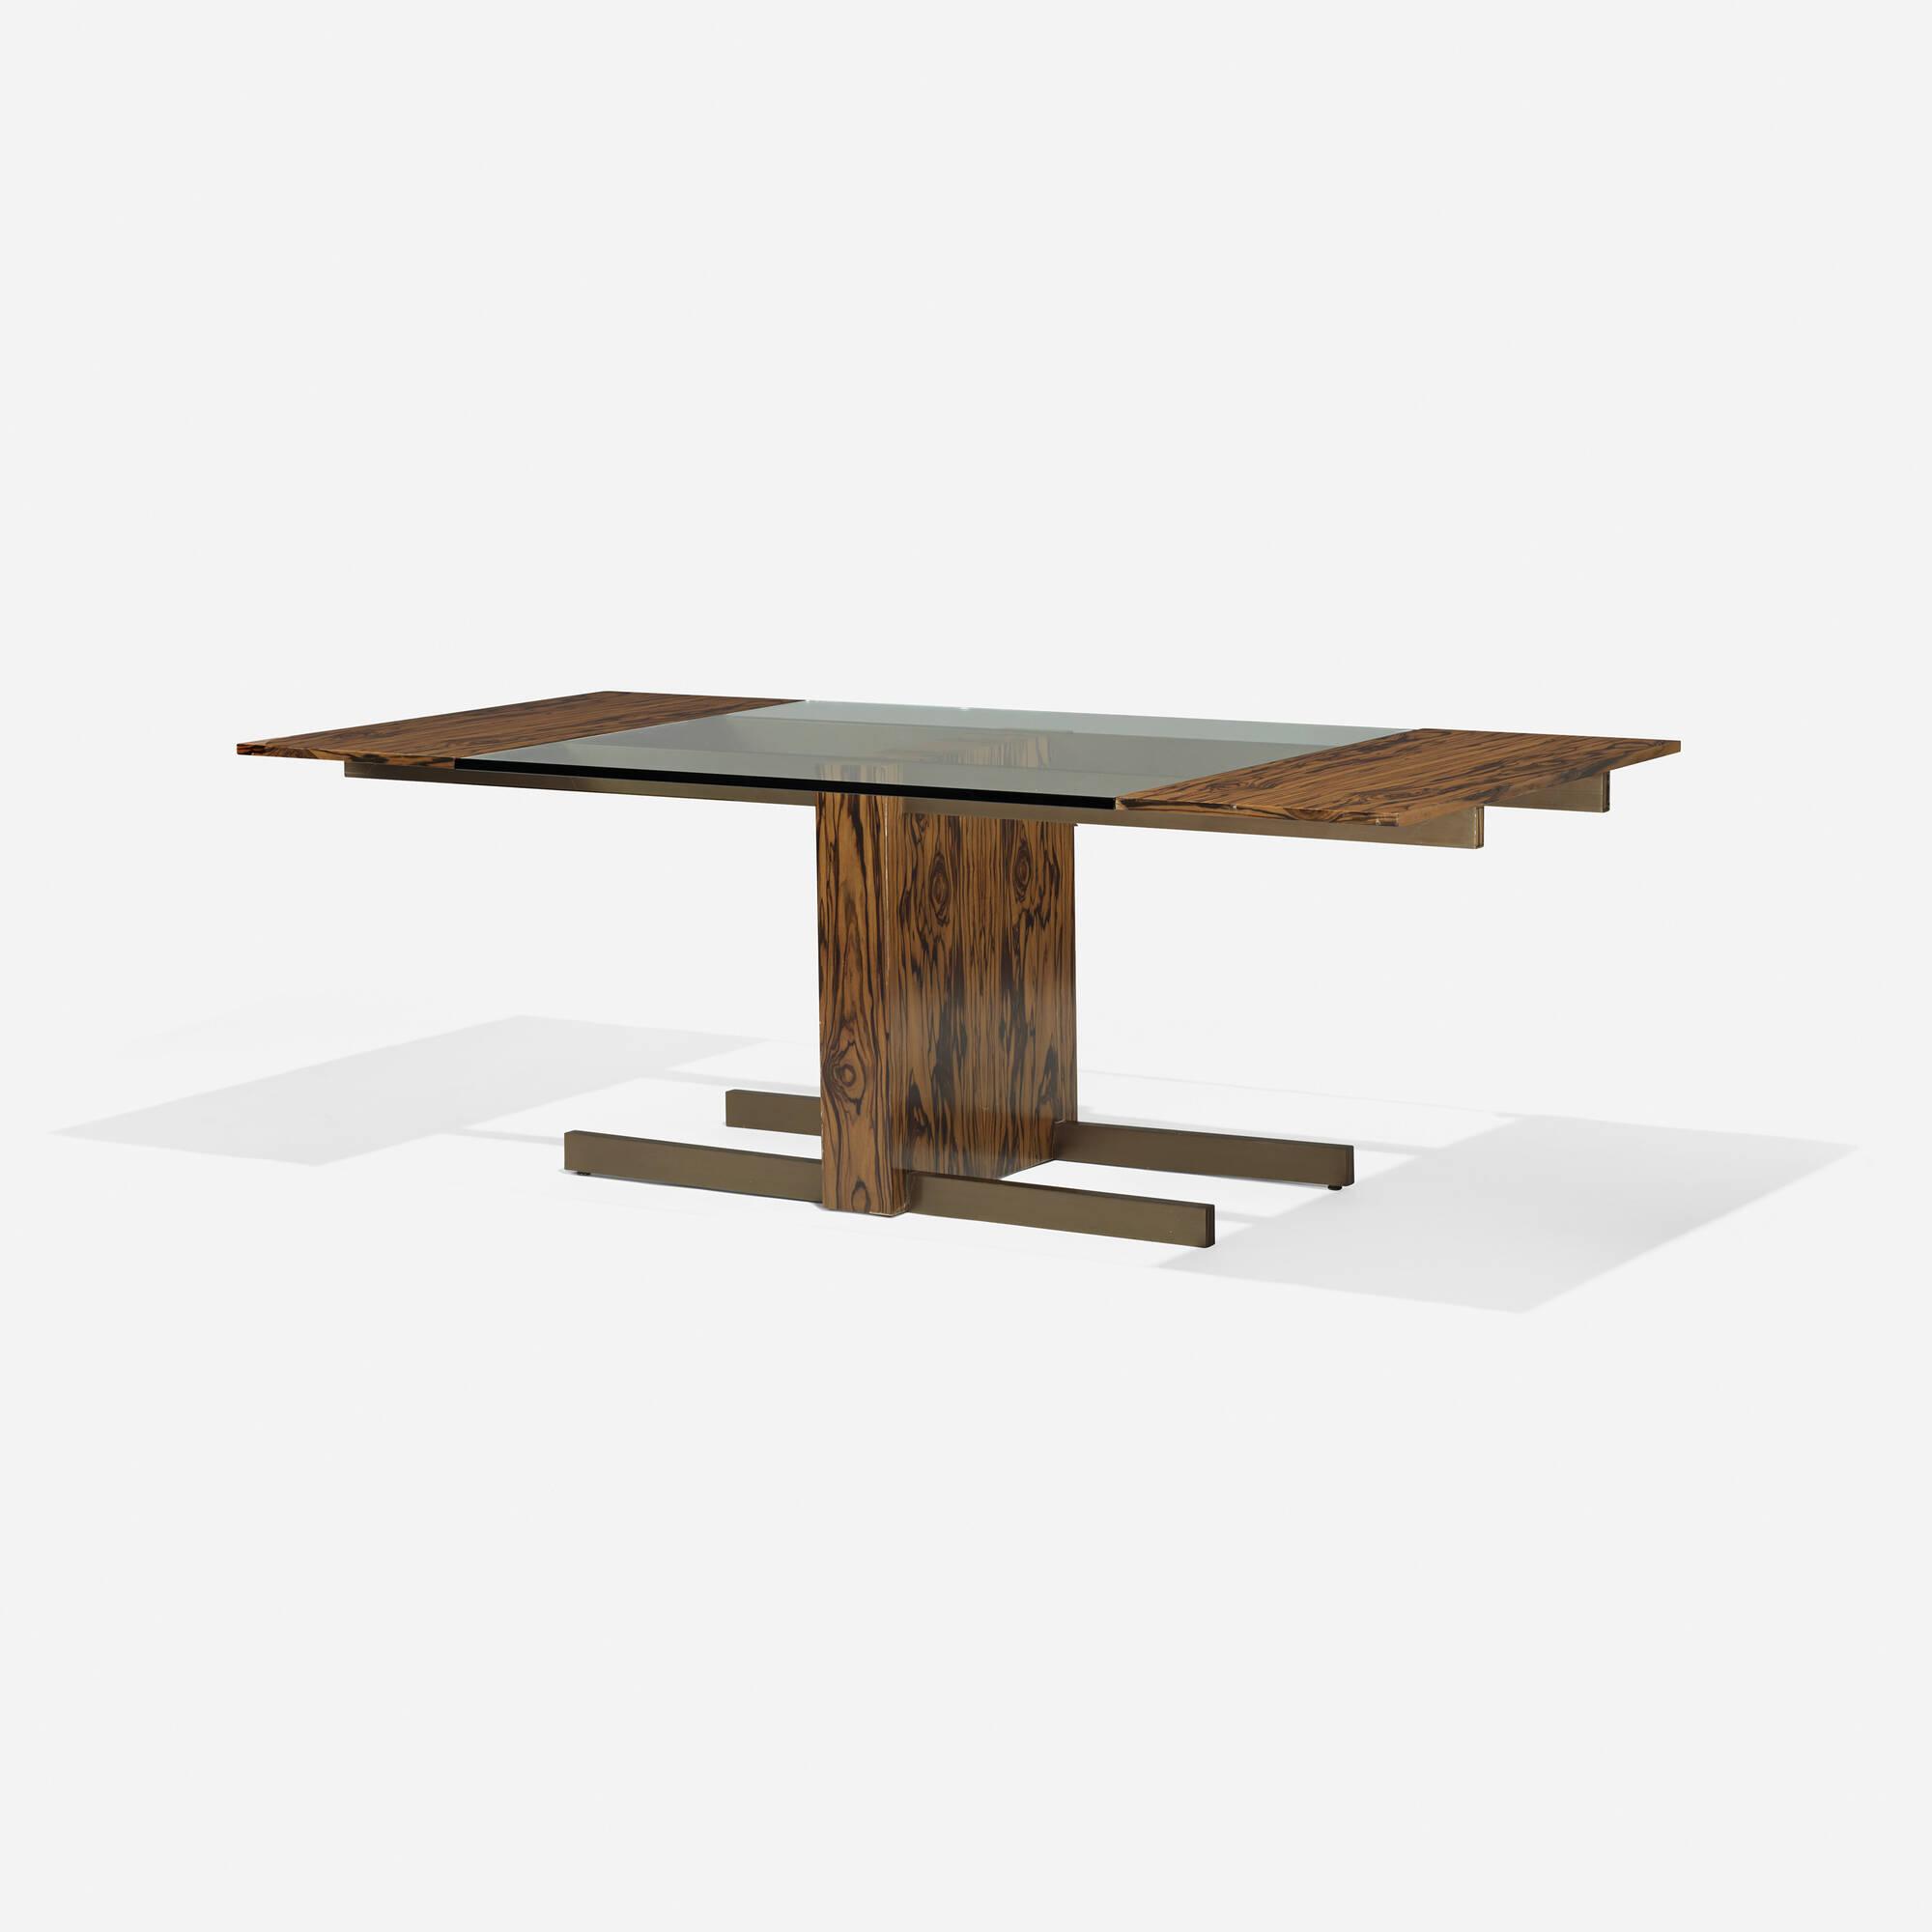 496 Vladimir Kagan Glass Top Extension Dining Table Model 6705 1 Of